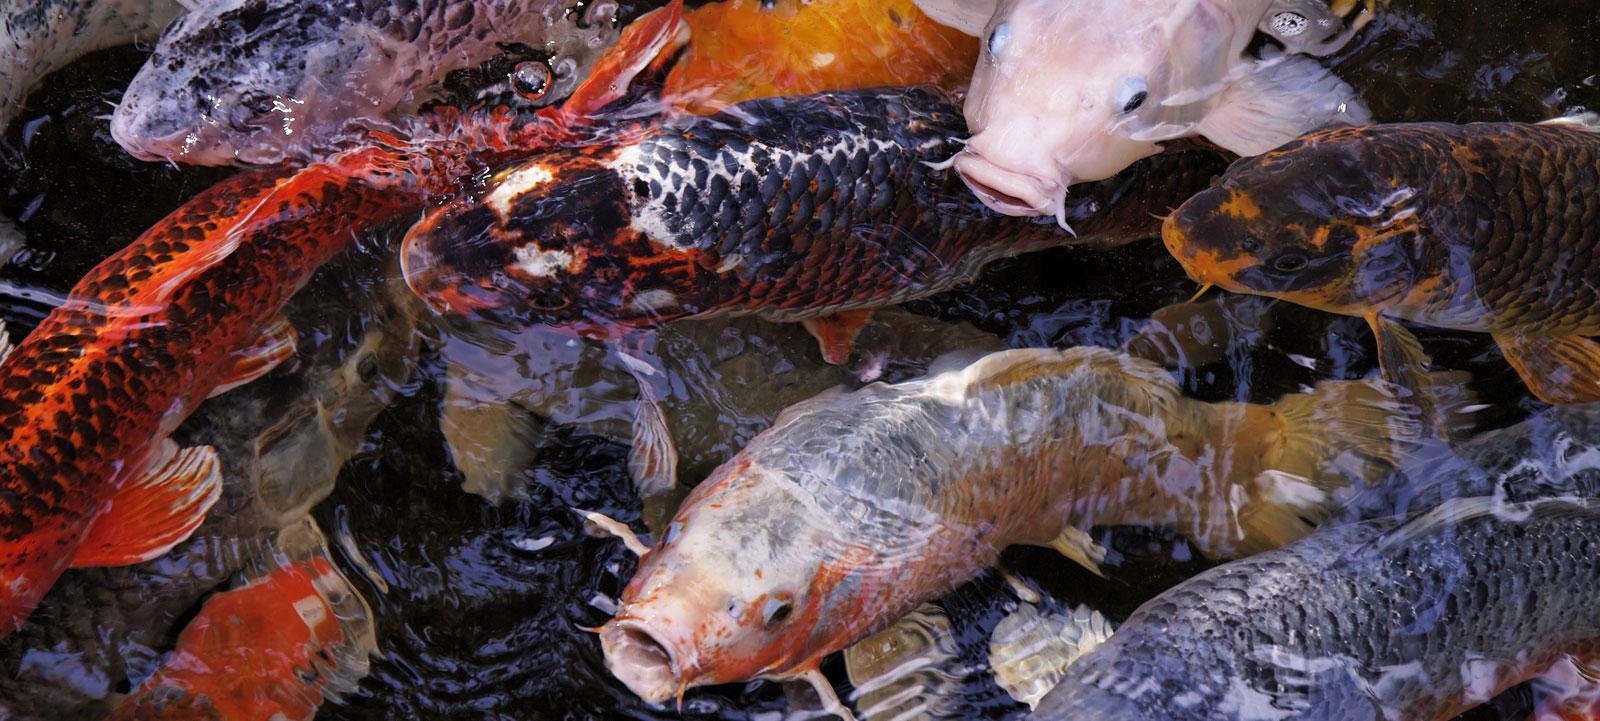 Comment lever des carpes koi jardins aquatiques for La carpe koi